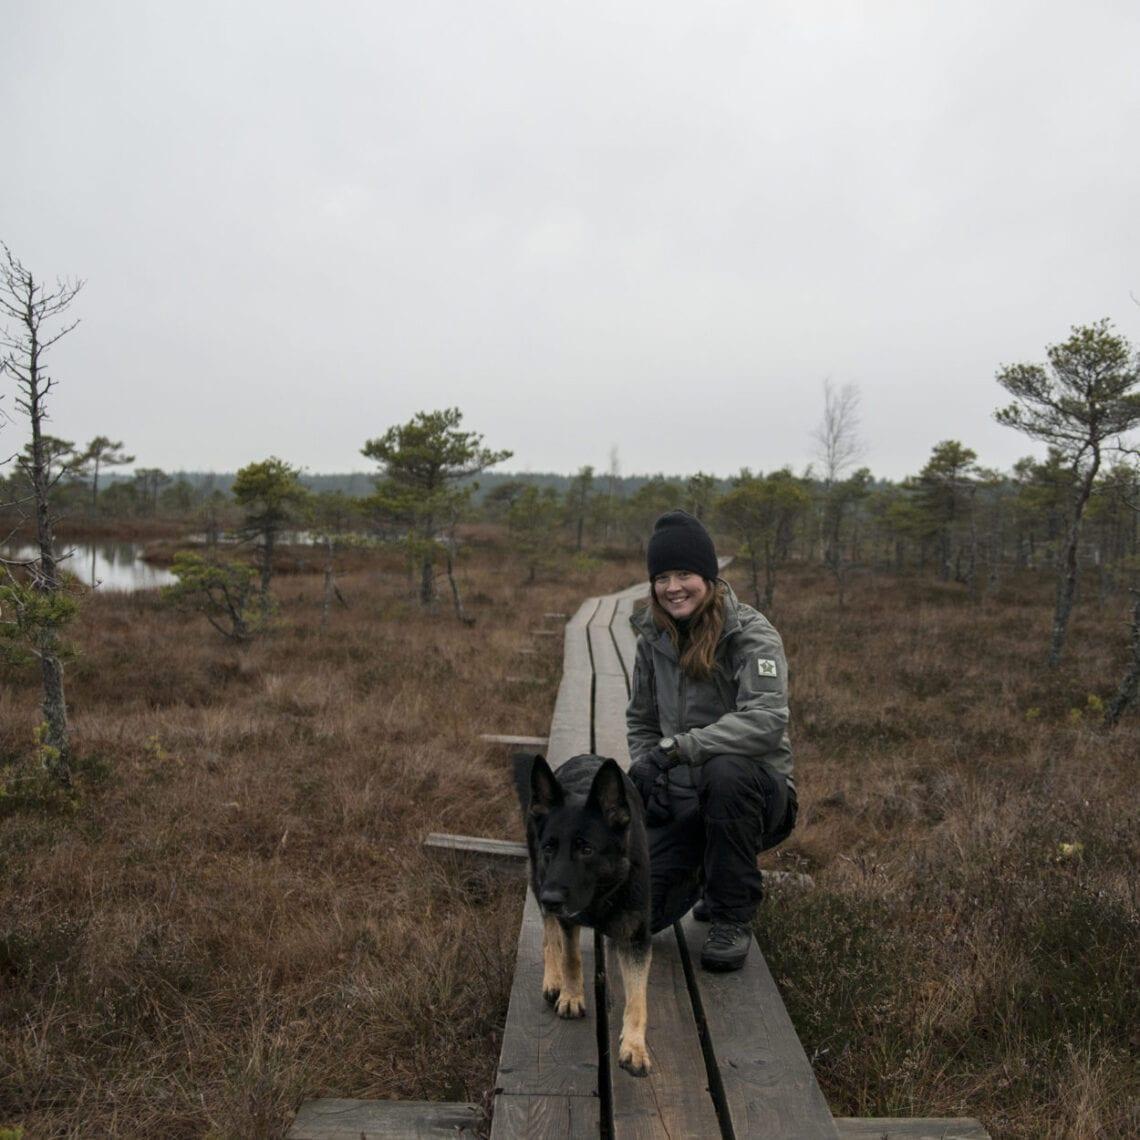 Wilda_Nilsson_Kemeri_högmosse_lettland